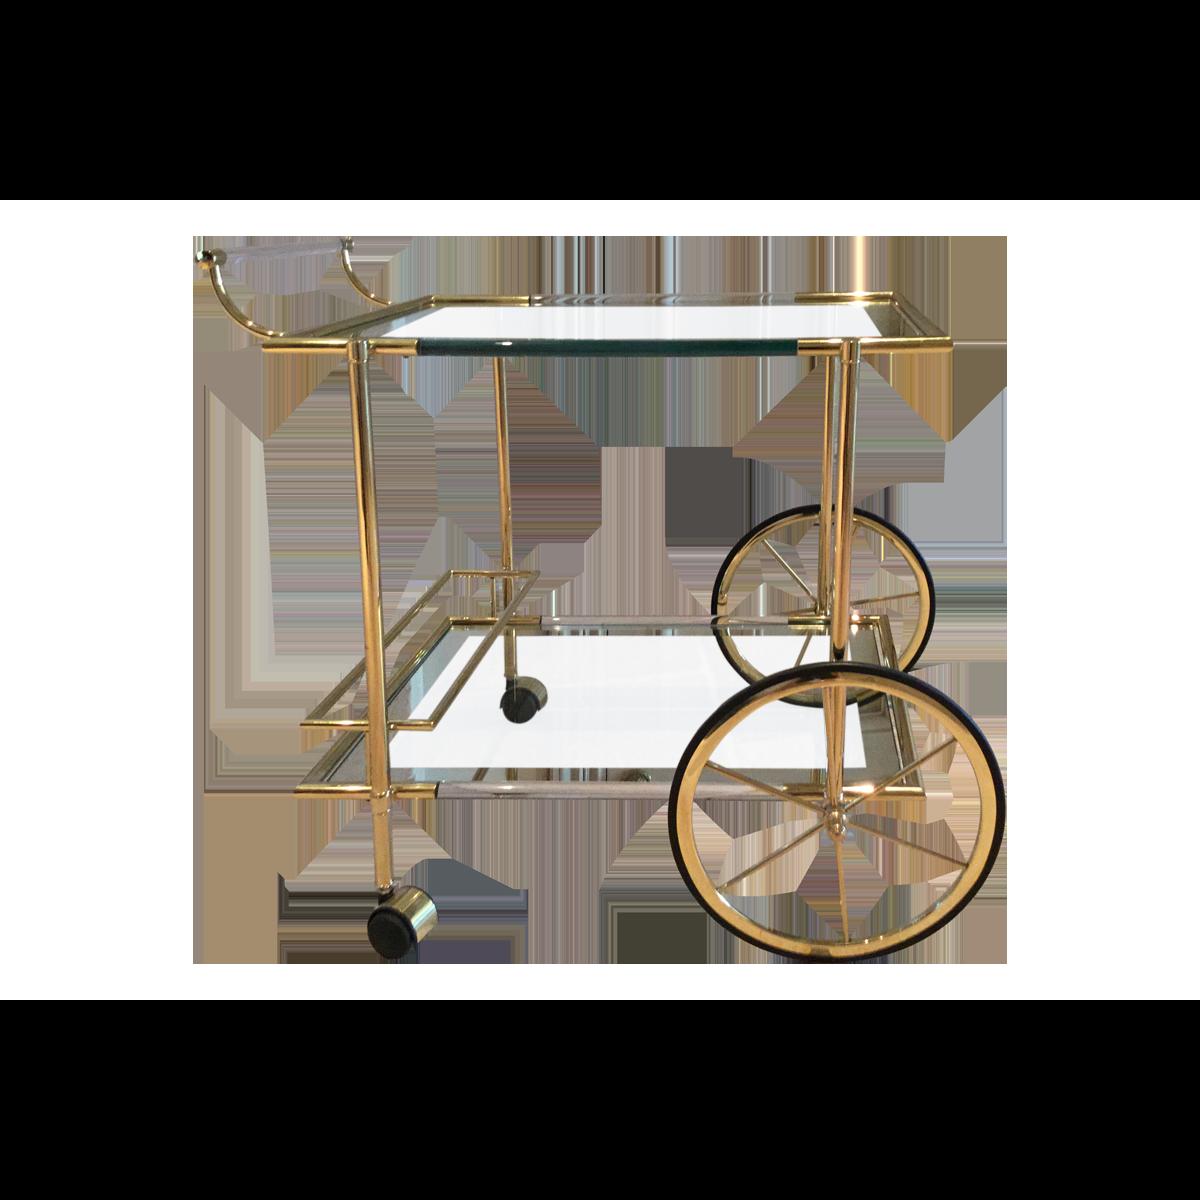 Regret, accessory add cart vintage